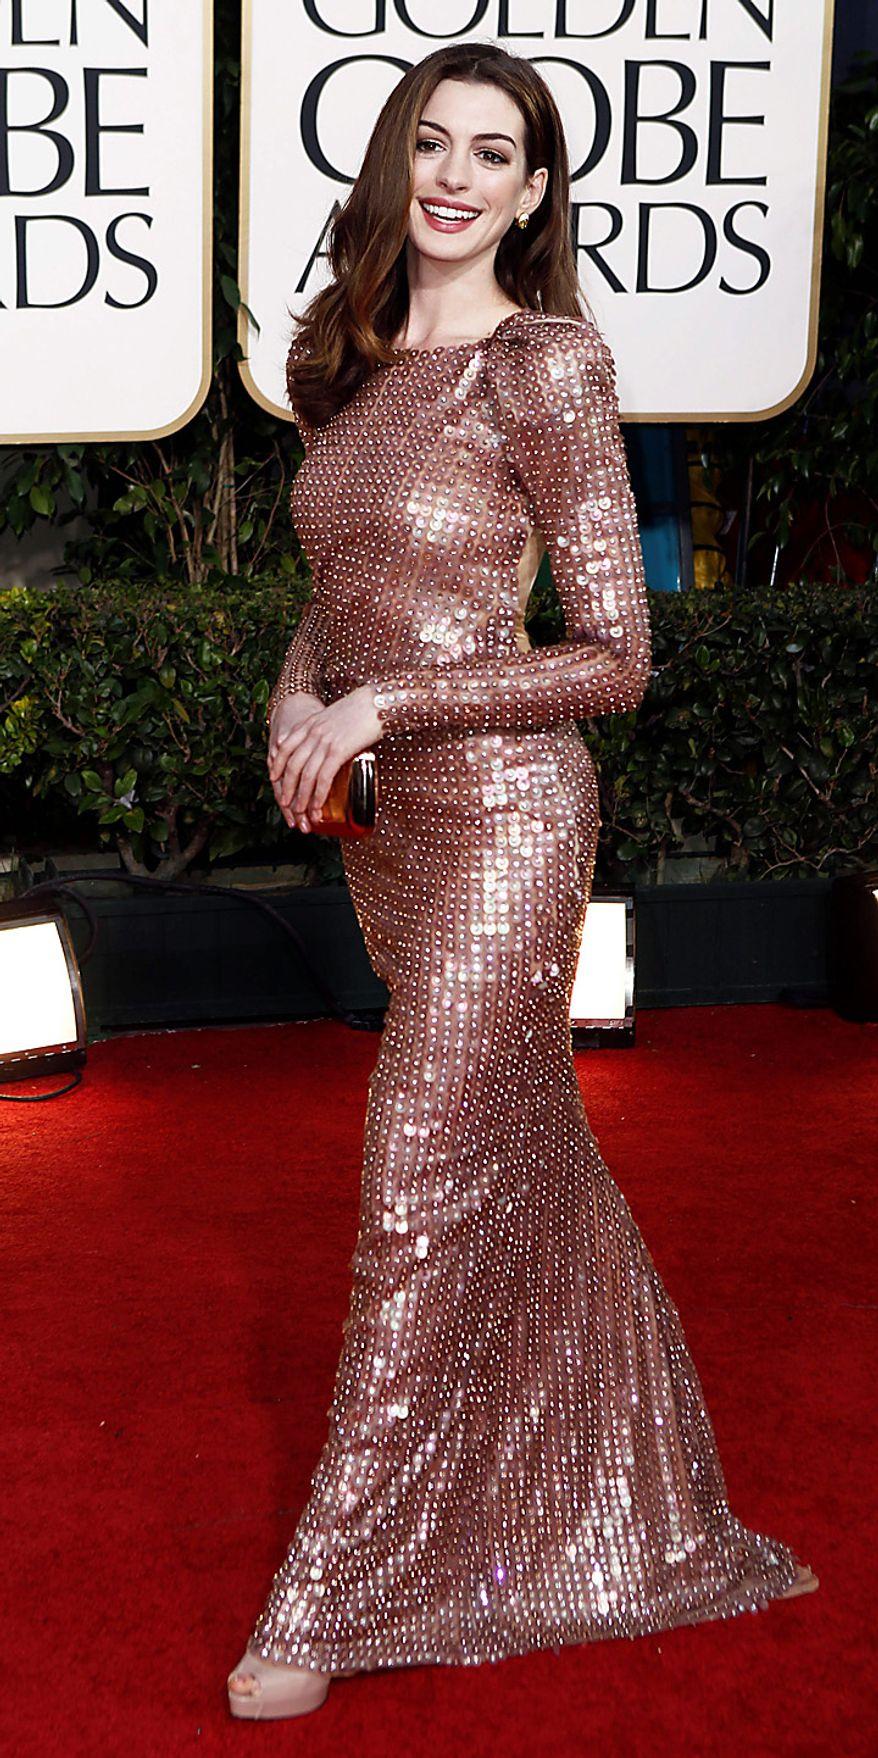 Anne Hathaway arrives for the Golden Globe Awards Sunday, Jan. 16, 2011, in Beverly Hills, Calif. (AP Photo/Matt Sayles)